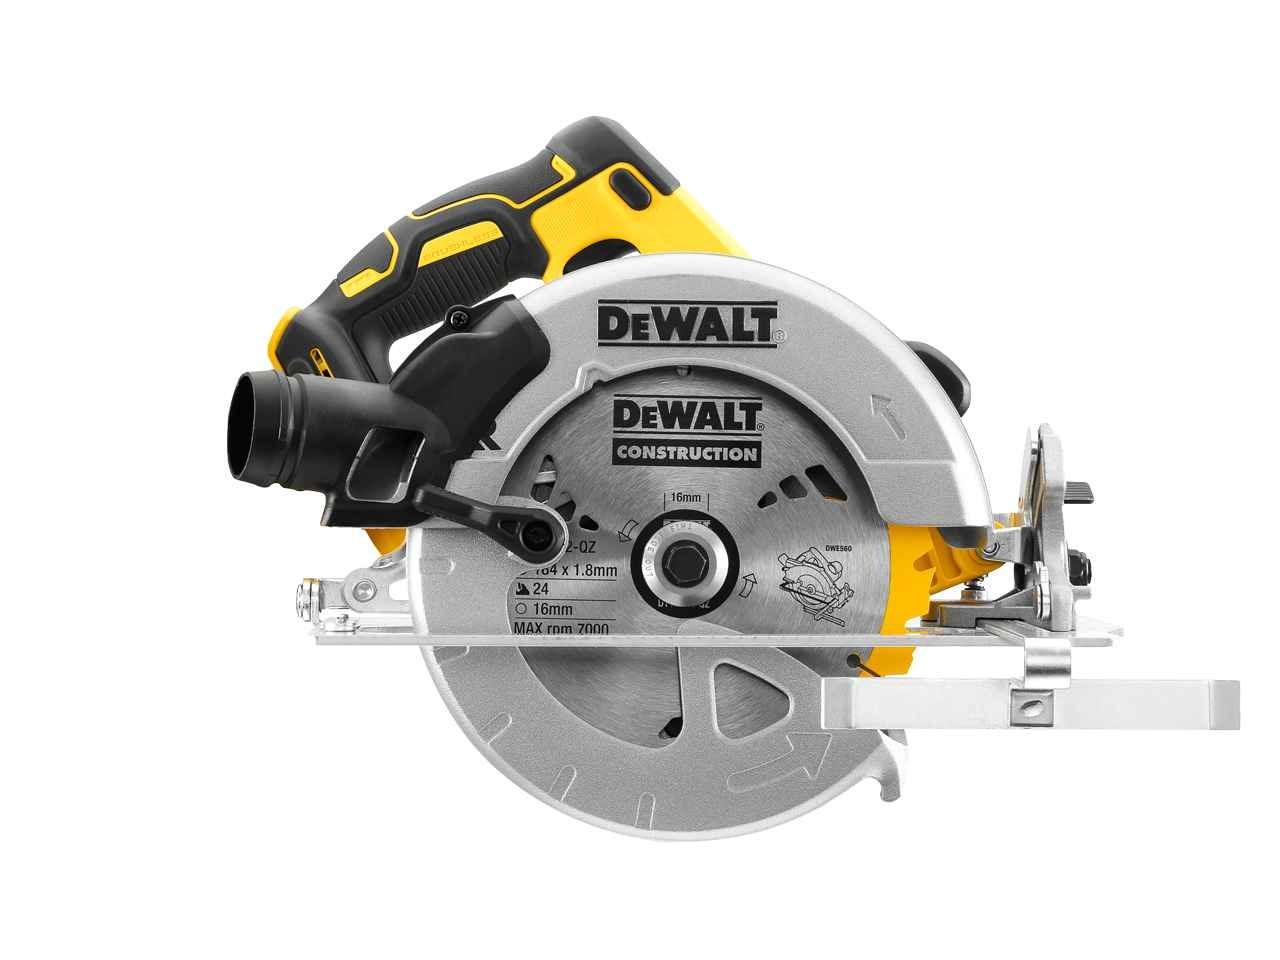 Dewalt dcs570n 18v xr brushless 184mm circular saw bare unit dewalt authorised reseller greentooth Image collections